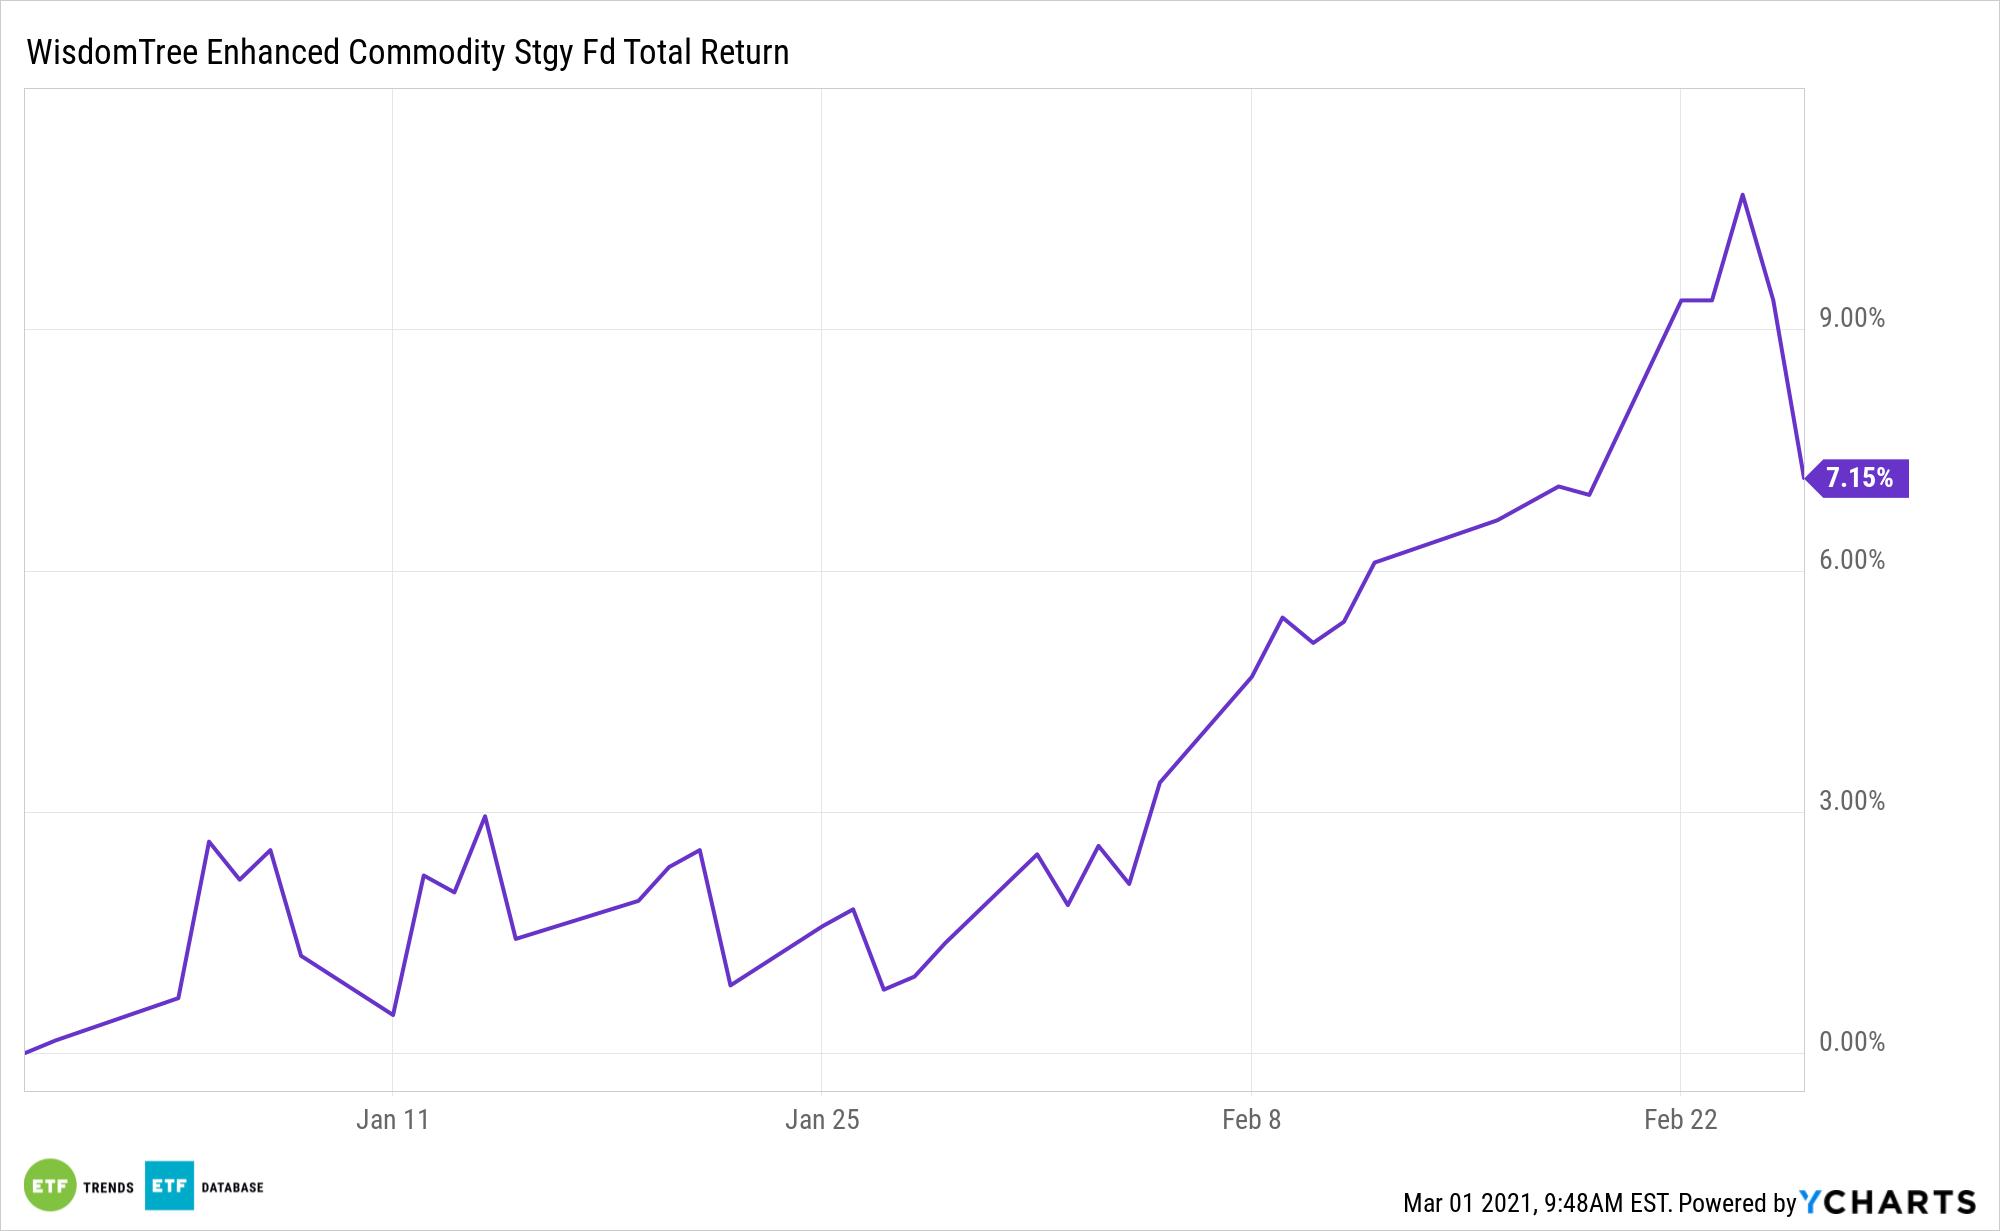 GCC 6 Month Total Return